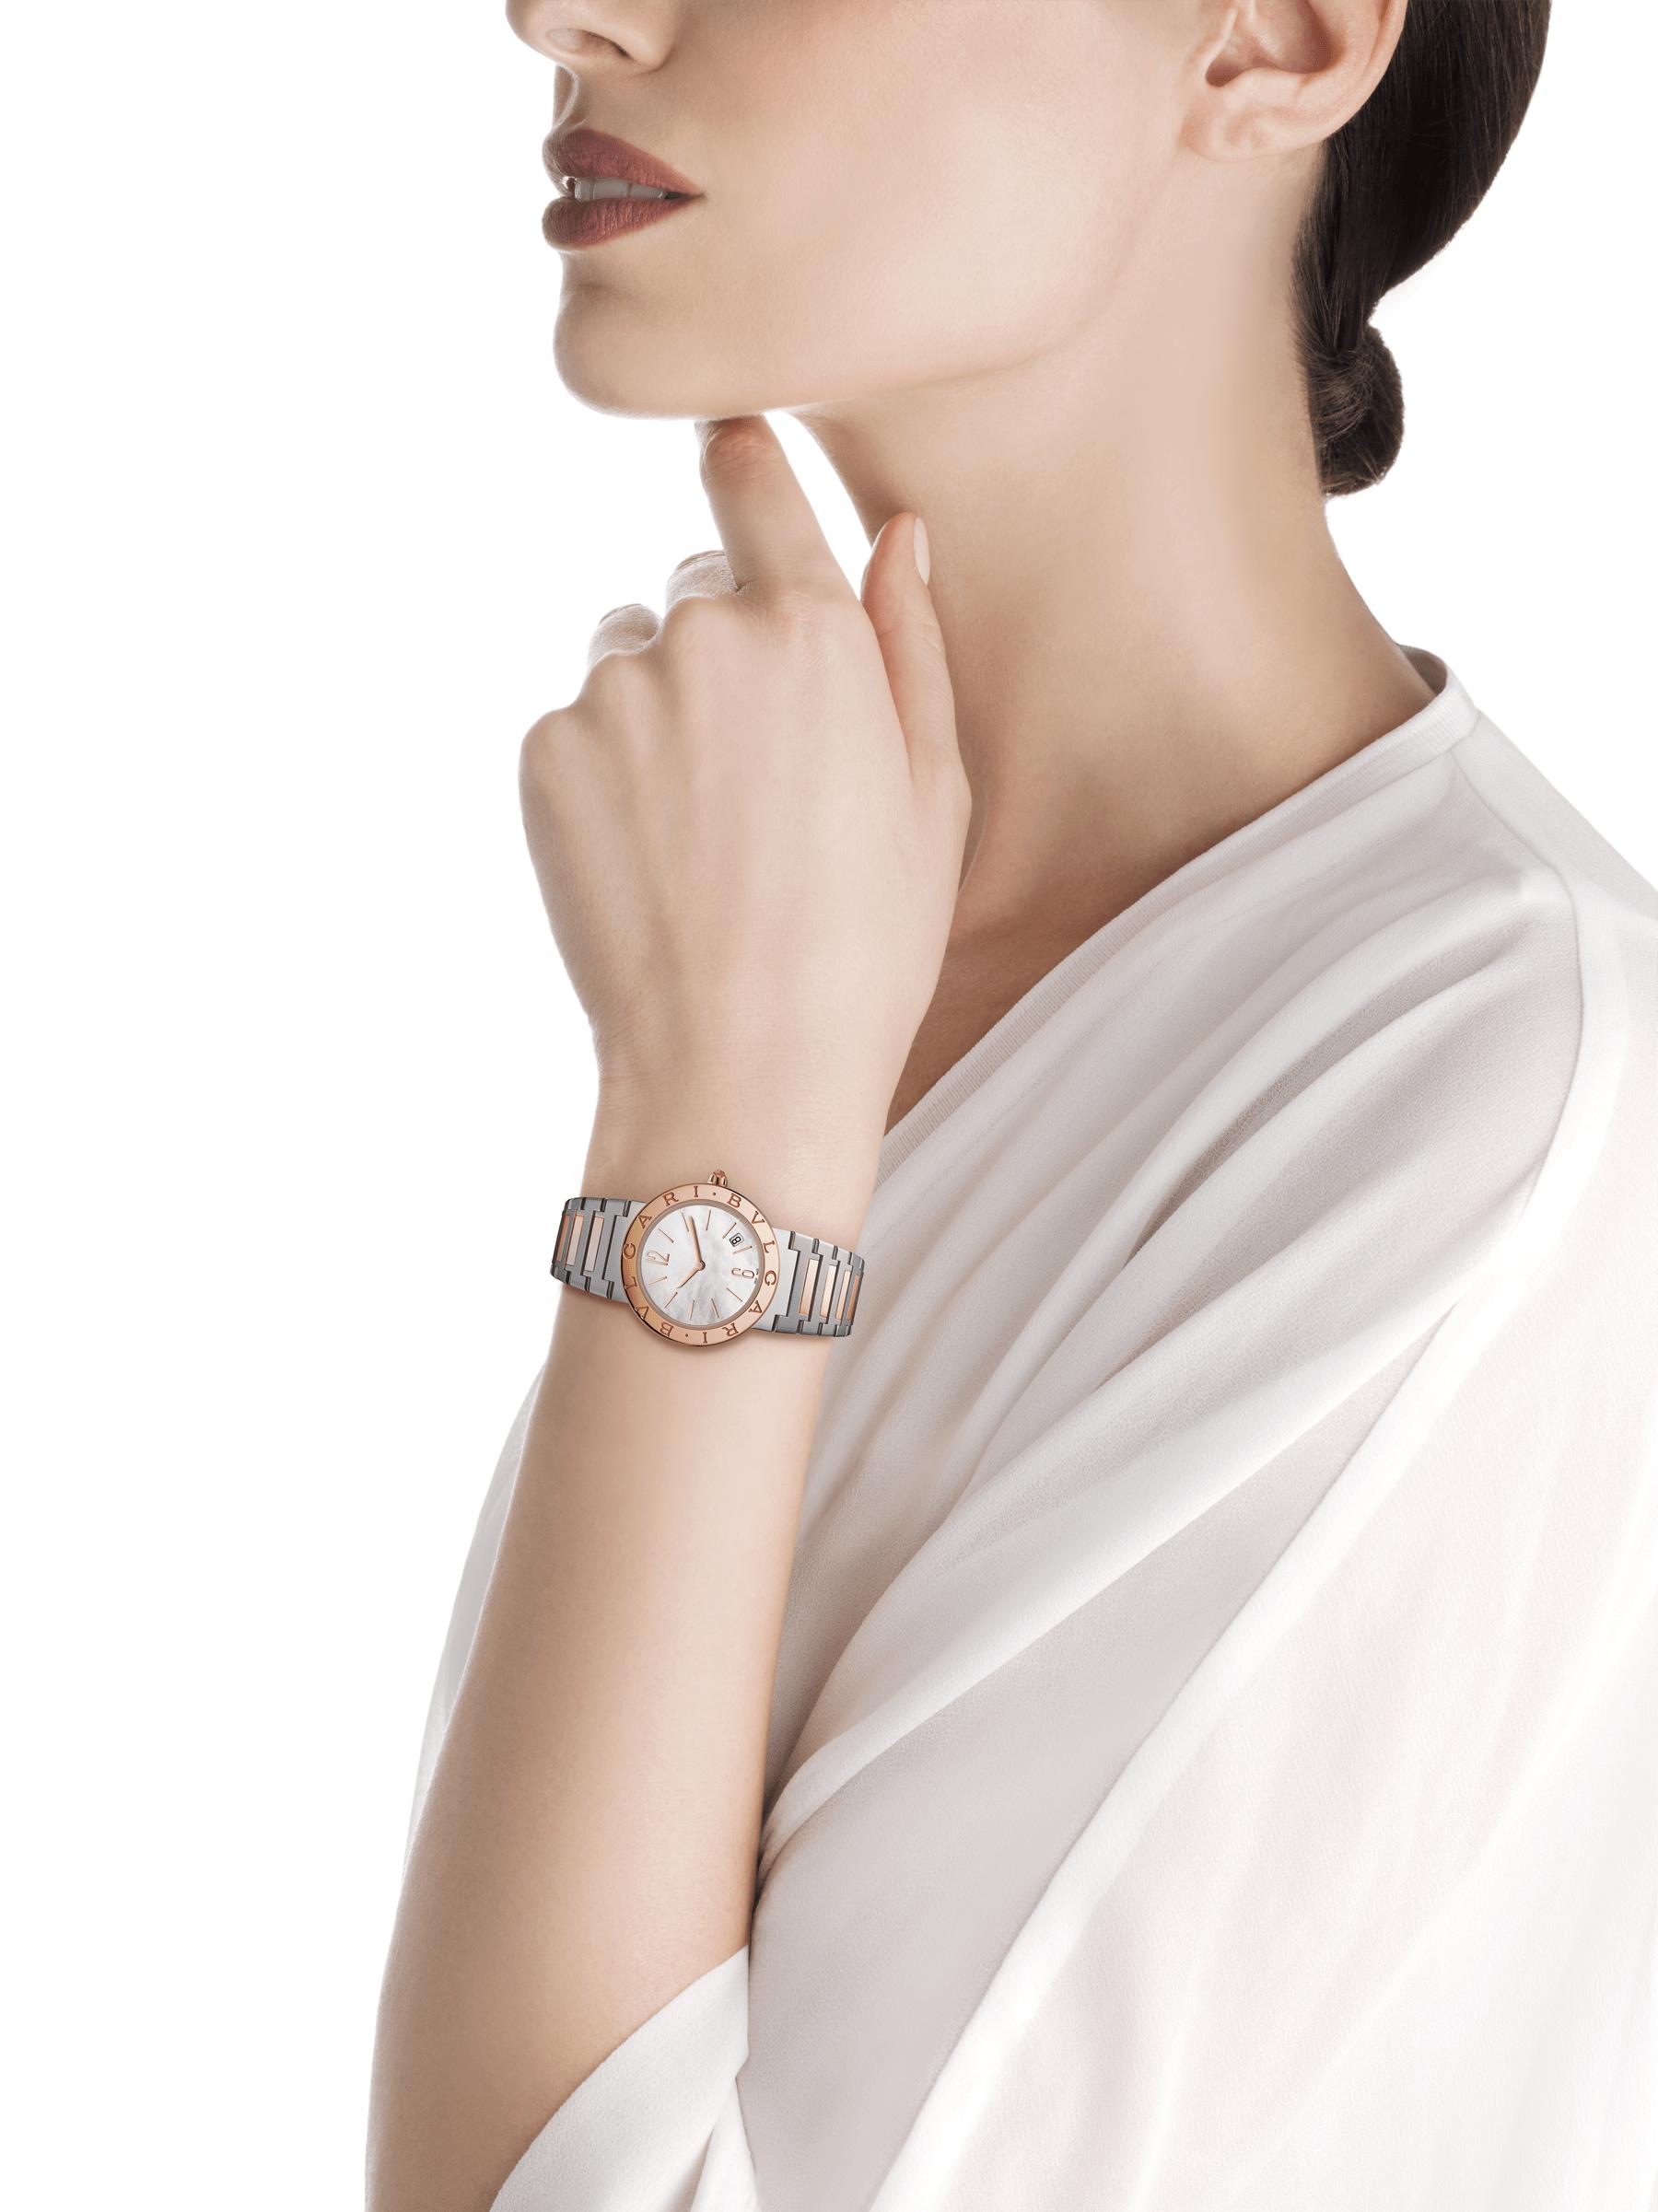 BVLGARI BVLGARI LADY腕表,精钢表壳,18K玫瑰金表圈镌刻双logo标志,白色珍珠母贝表盘,18K玫瑰金和精钢表链 102925 image 3